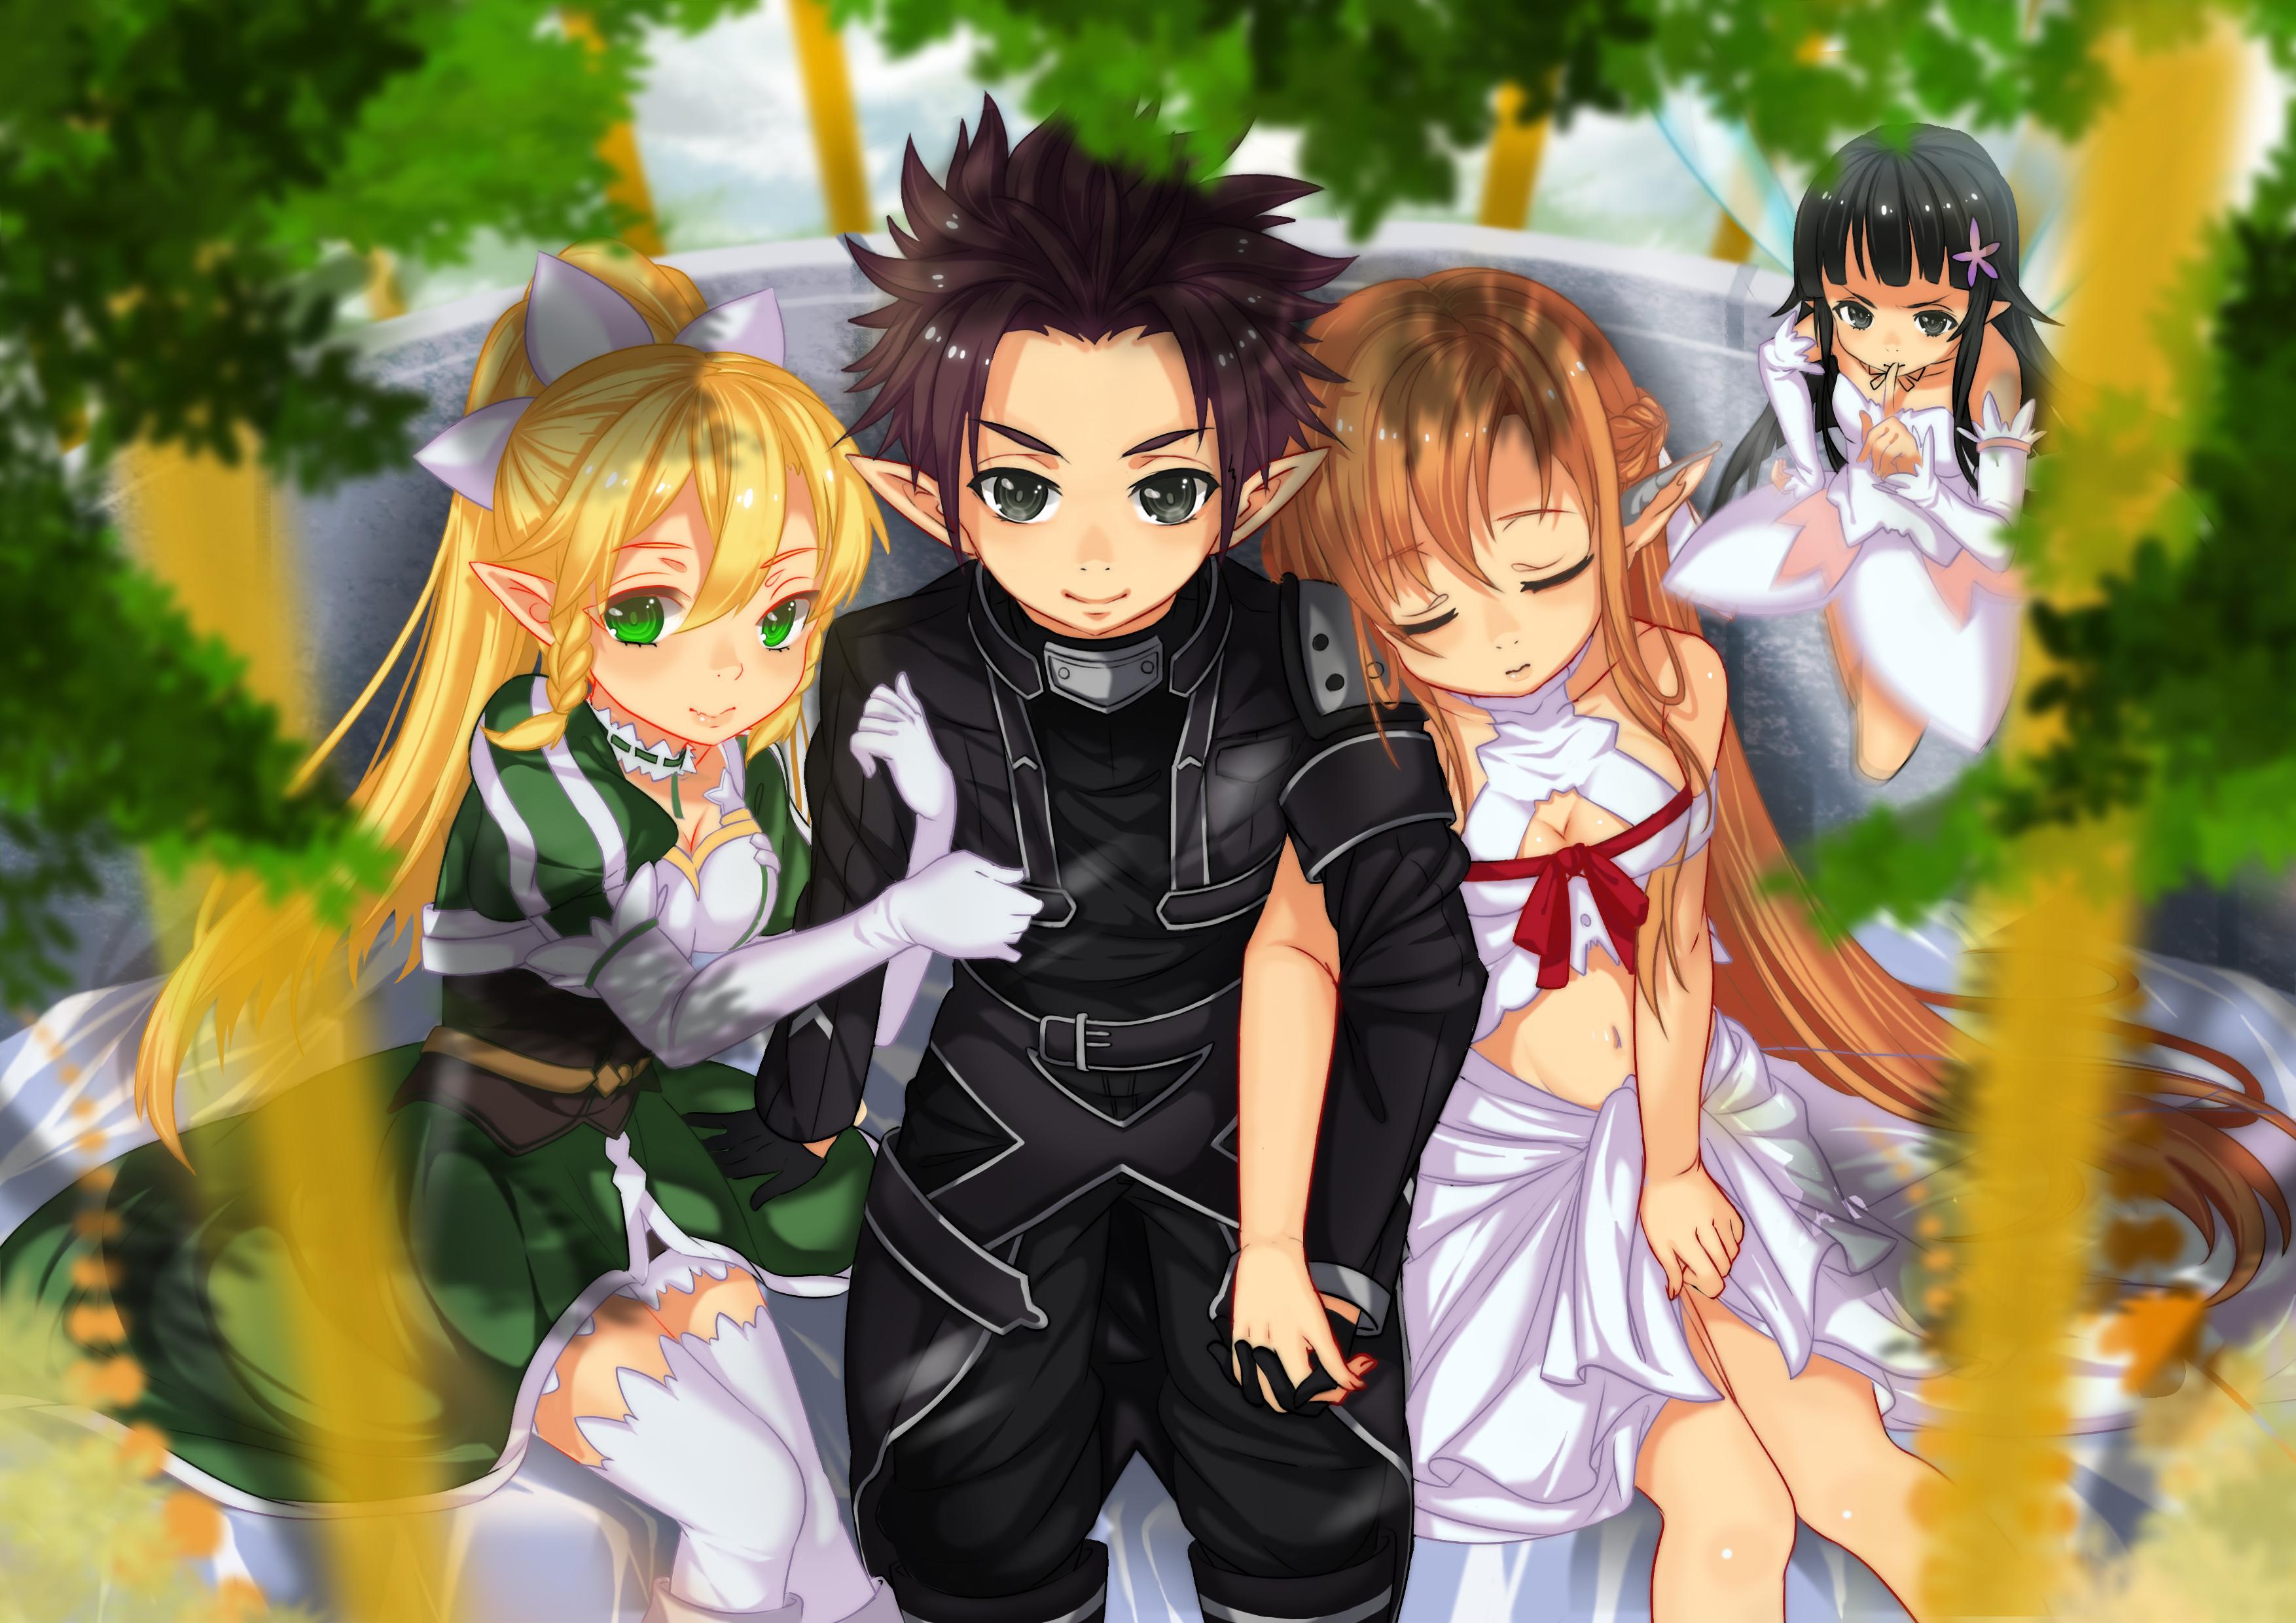 Sword Art Online Hd Wallpaper Background Image 3508x2480 Id